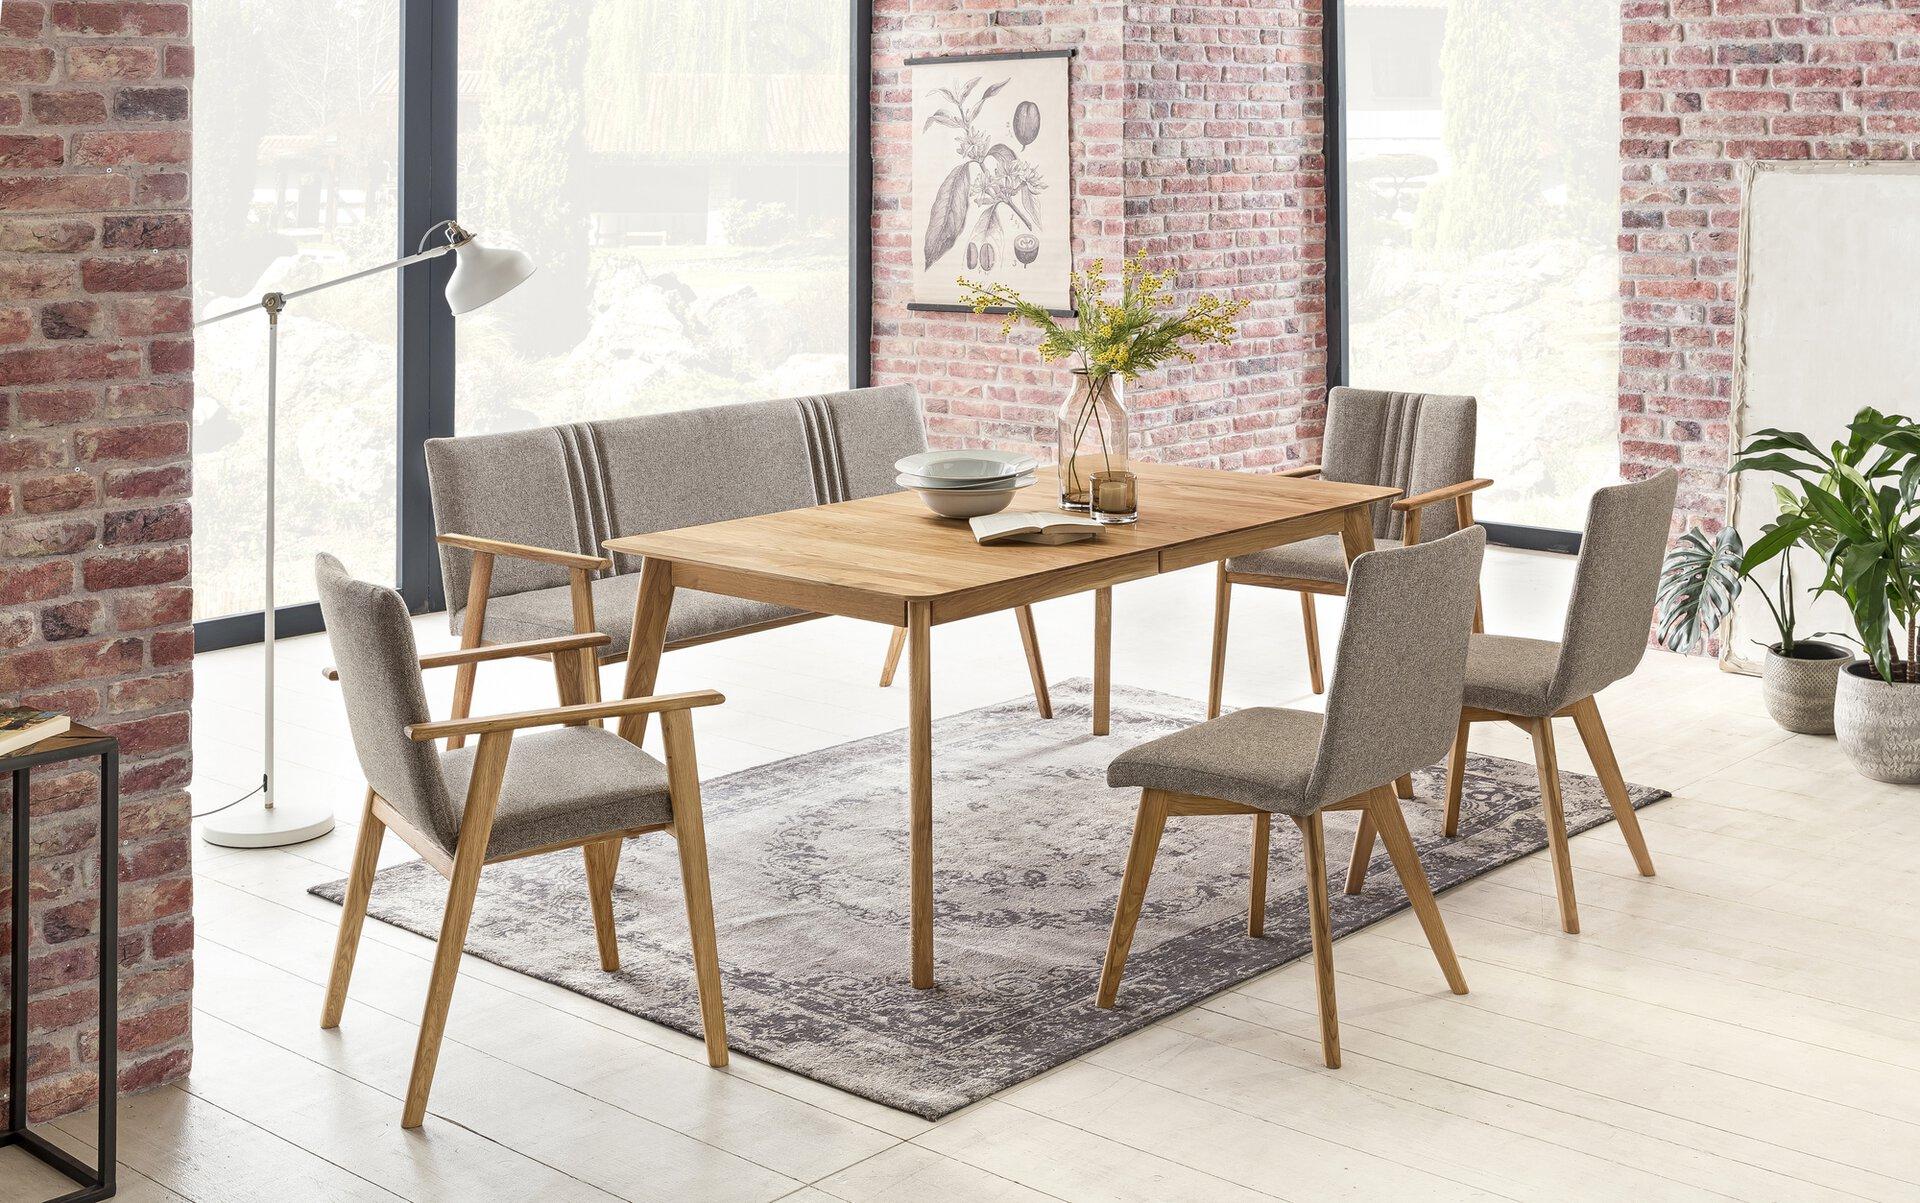 Sitzbank BALDIN Vito Textil 60 x 87 x 170 cm